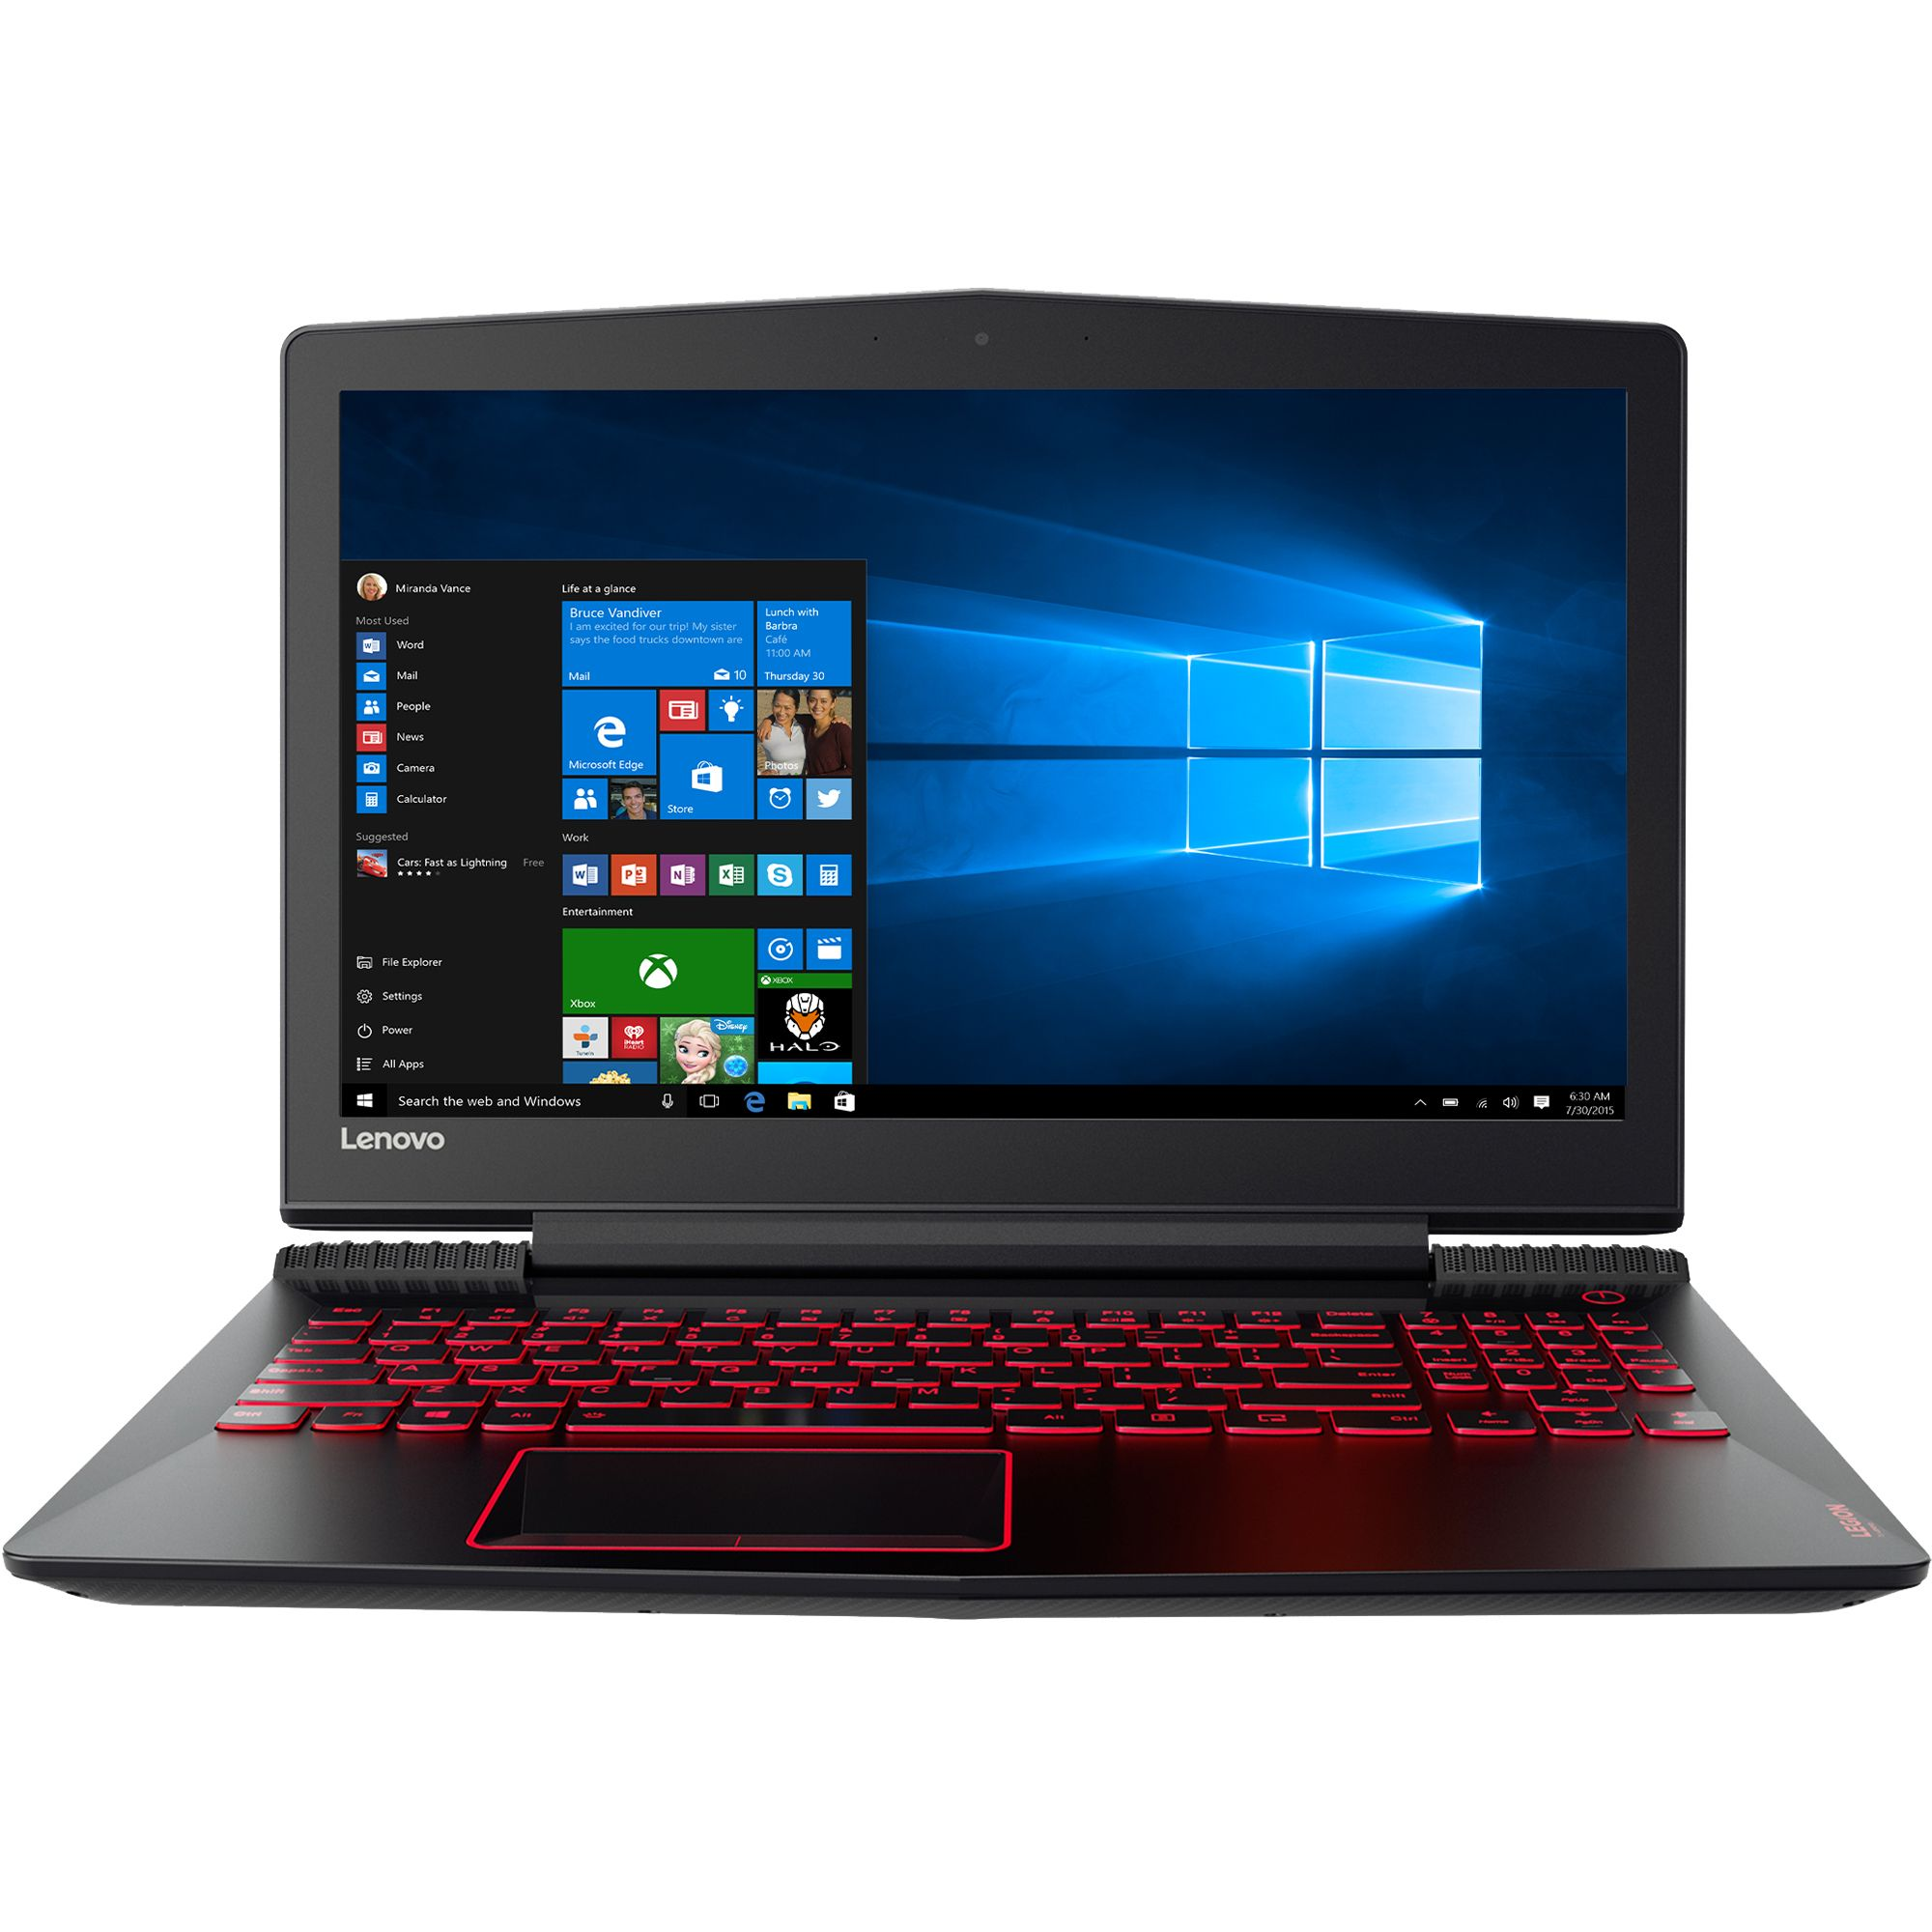 Notebook Lenovo Legion Y520 15.6 Full HD Intel Core i7-7700HQ GTX 1050 Ti-4GB RAM 8GB SSD 512GB FreeDOS Negru